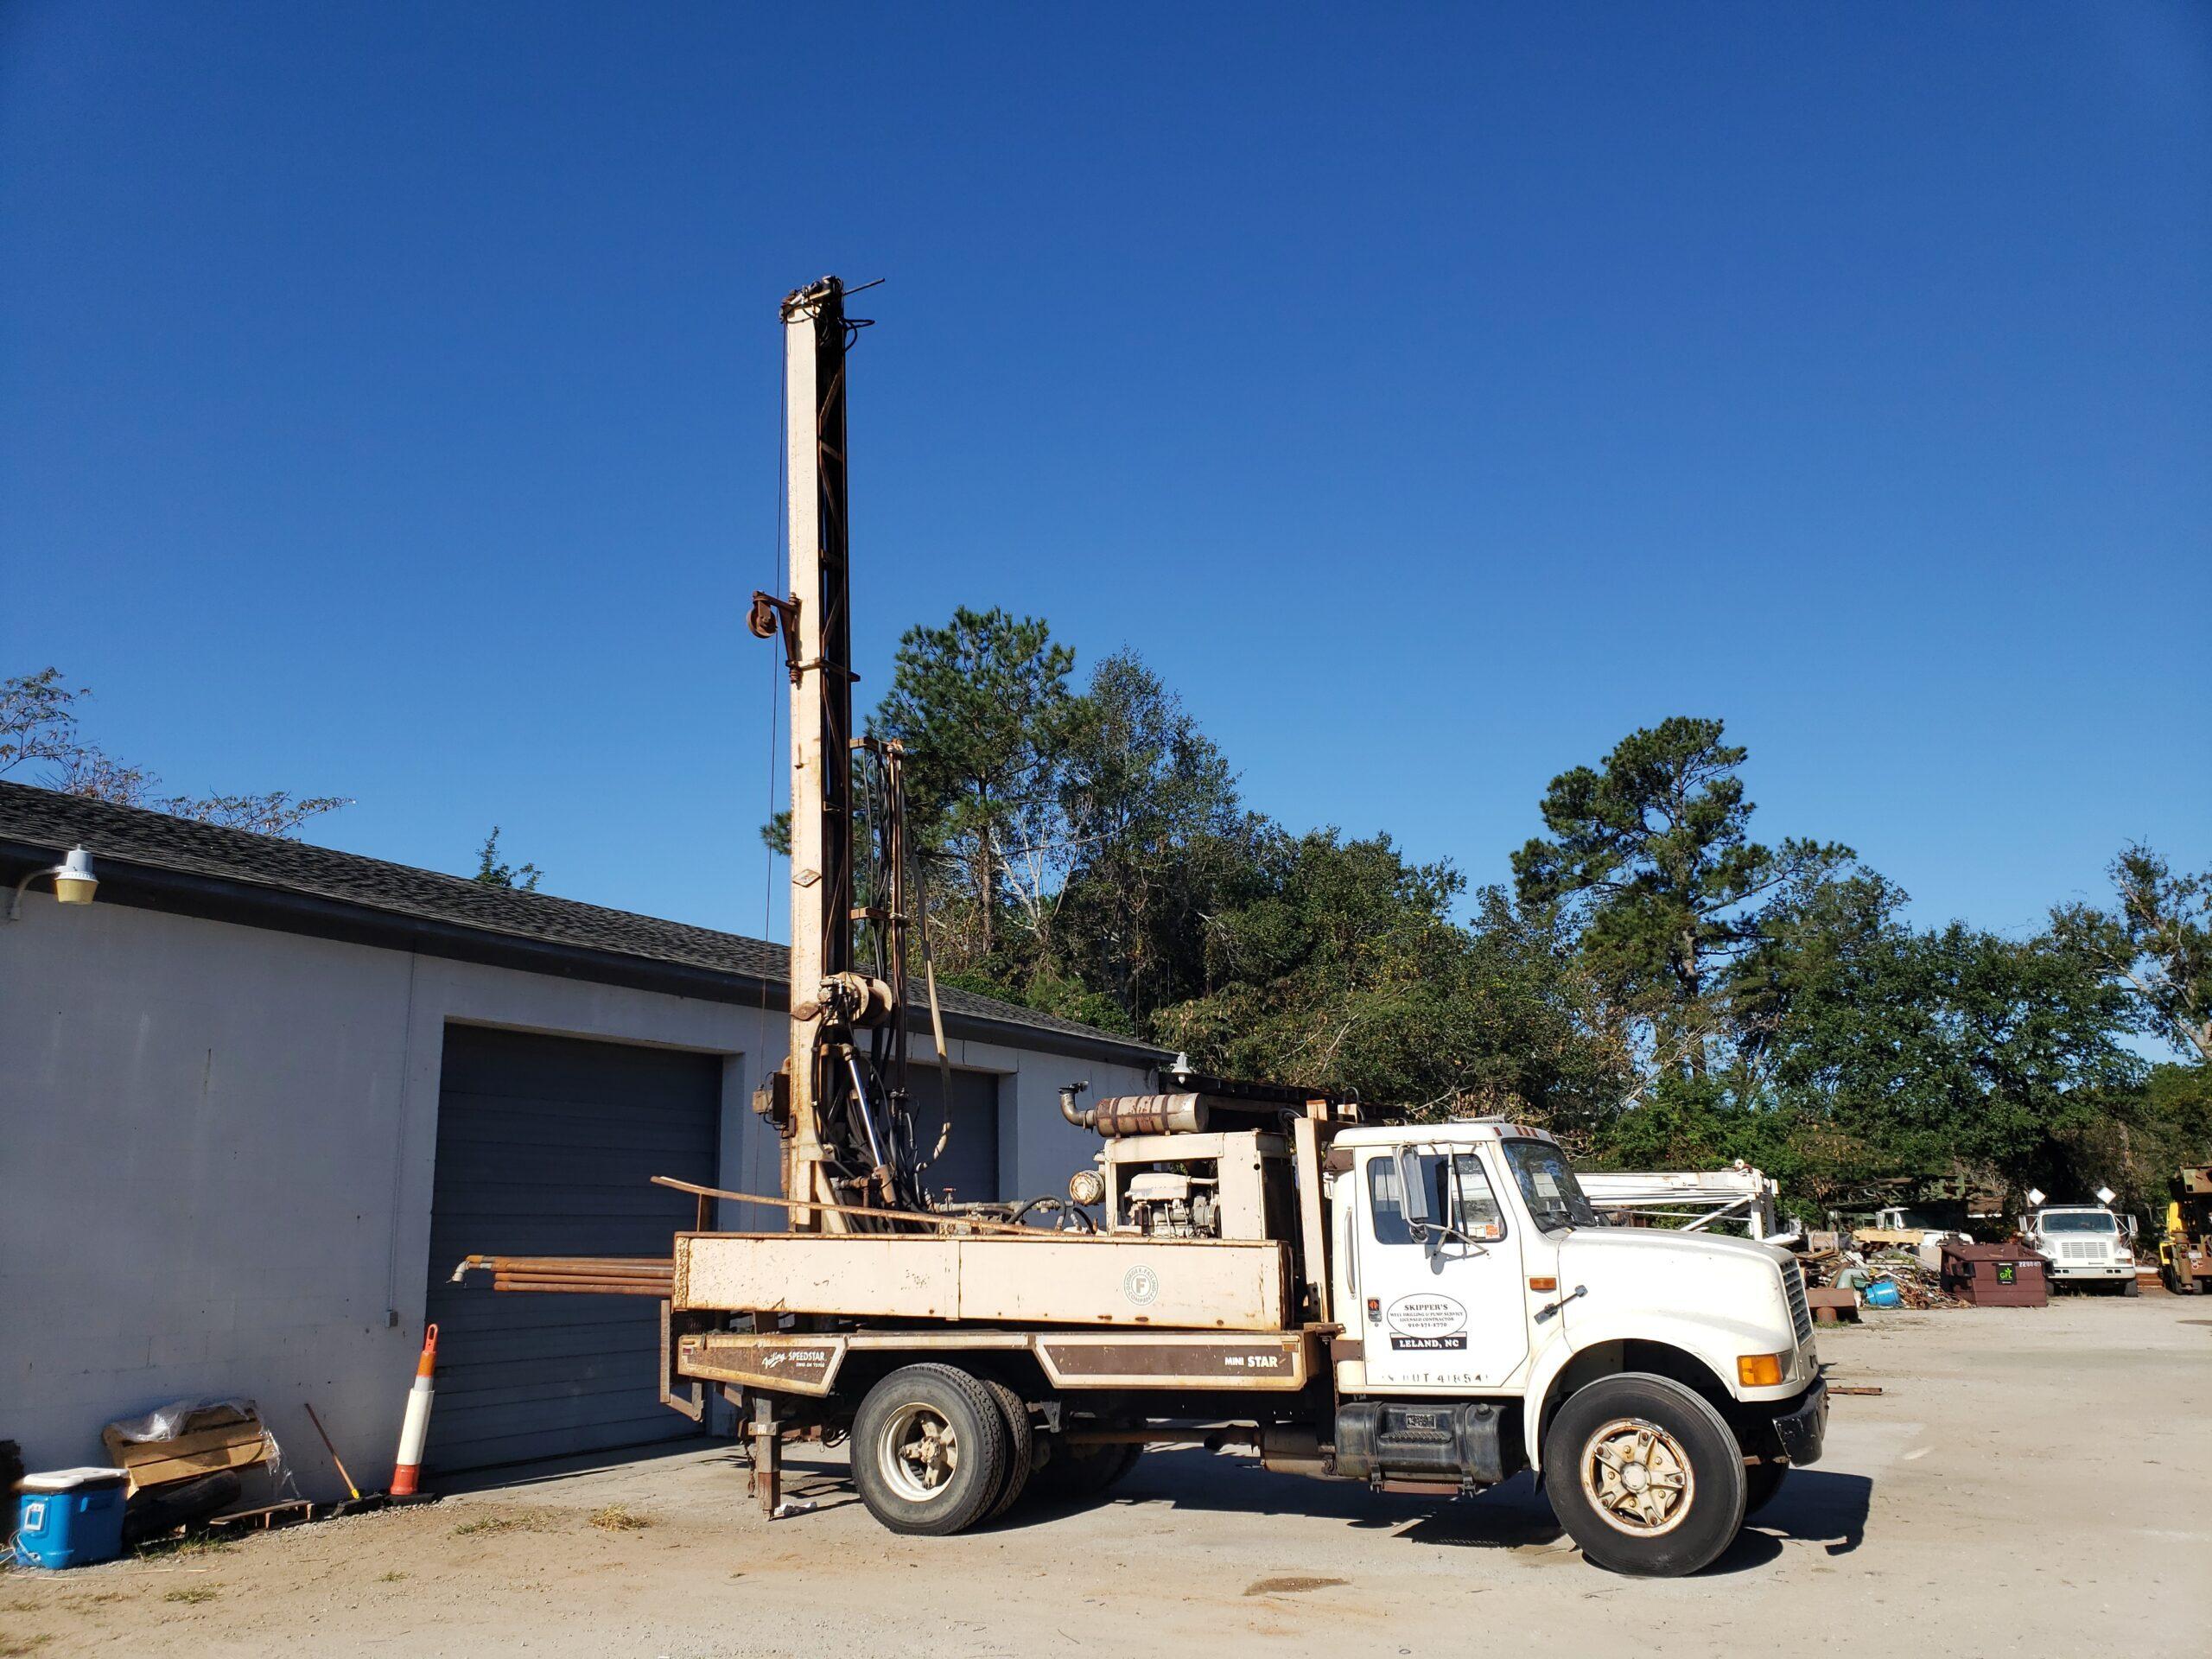 Skipper's Well Drilling & Pump Service Rig